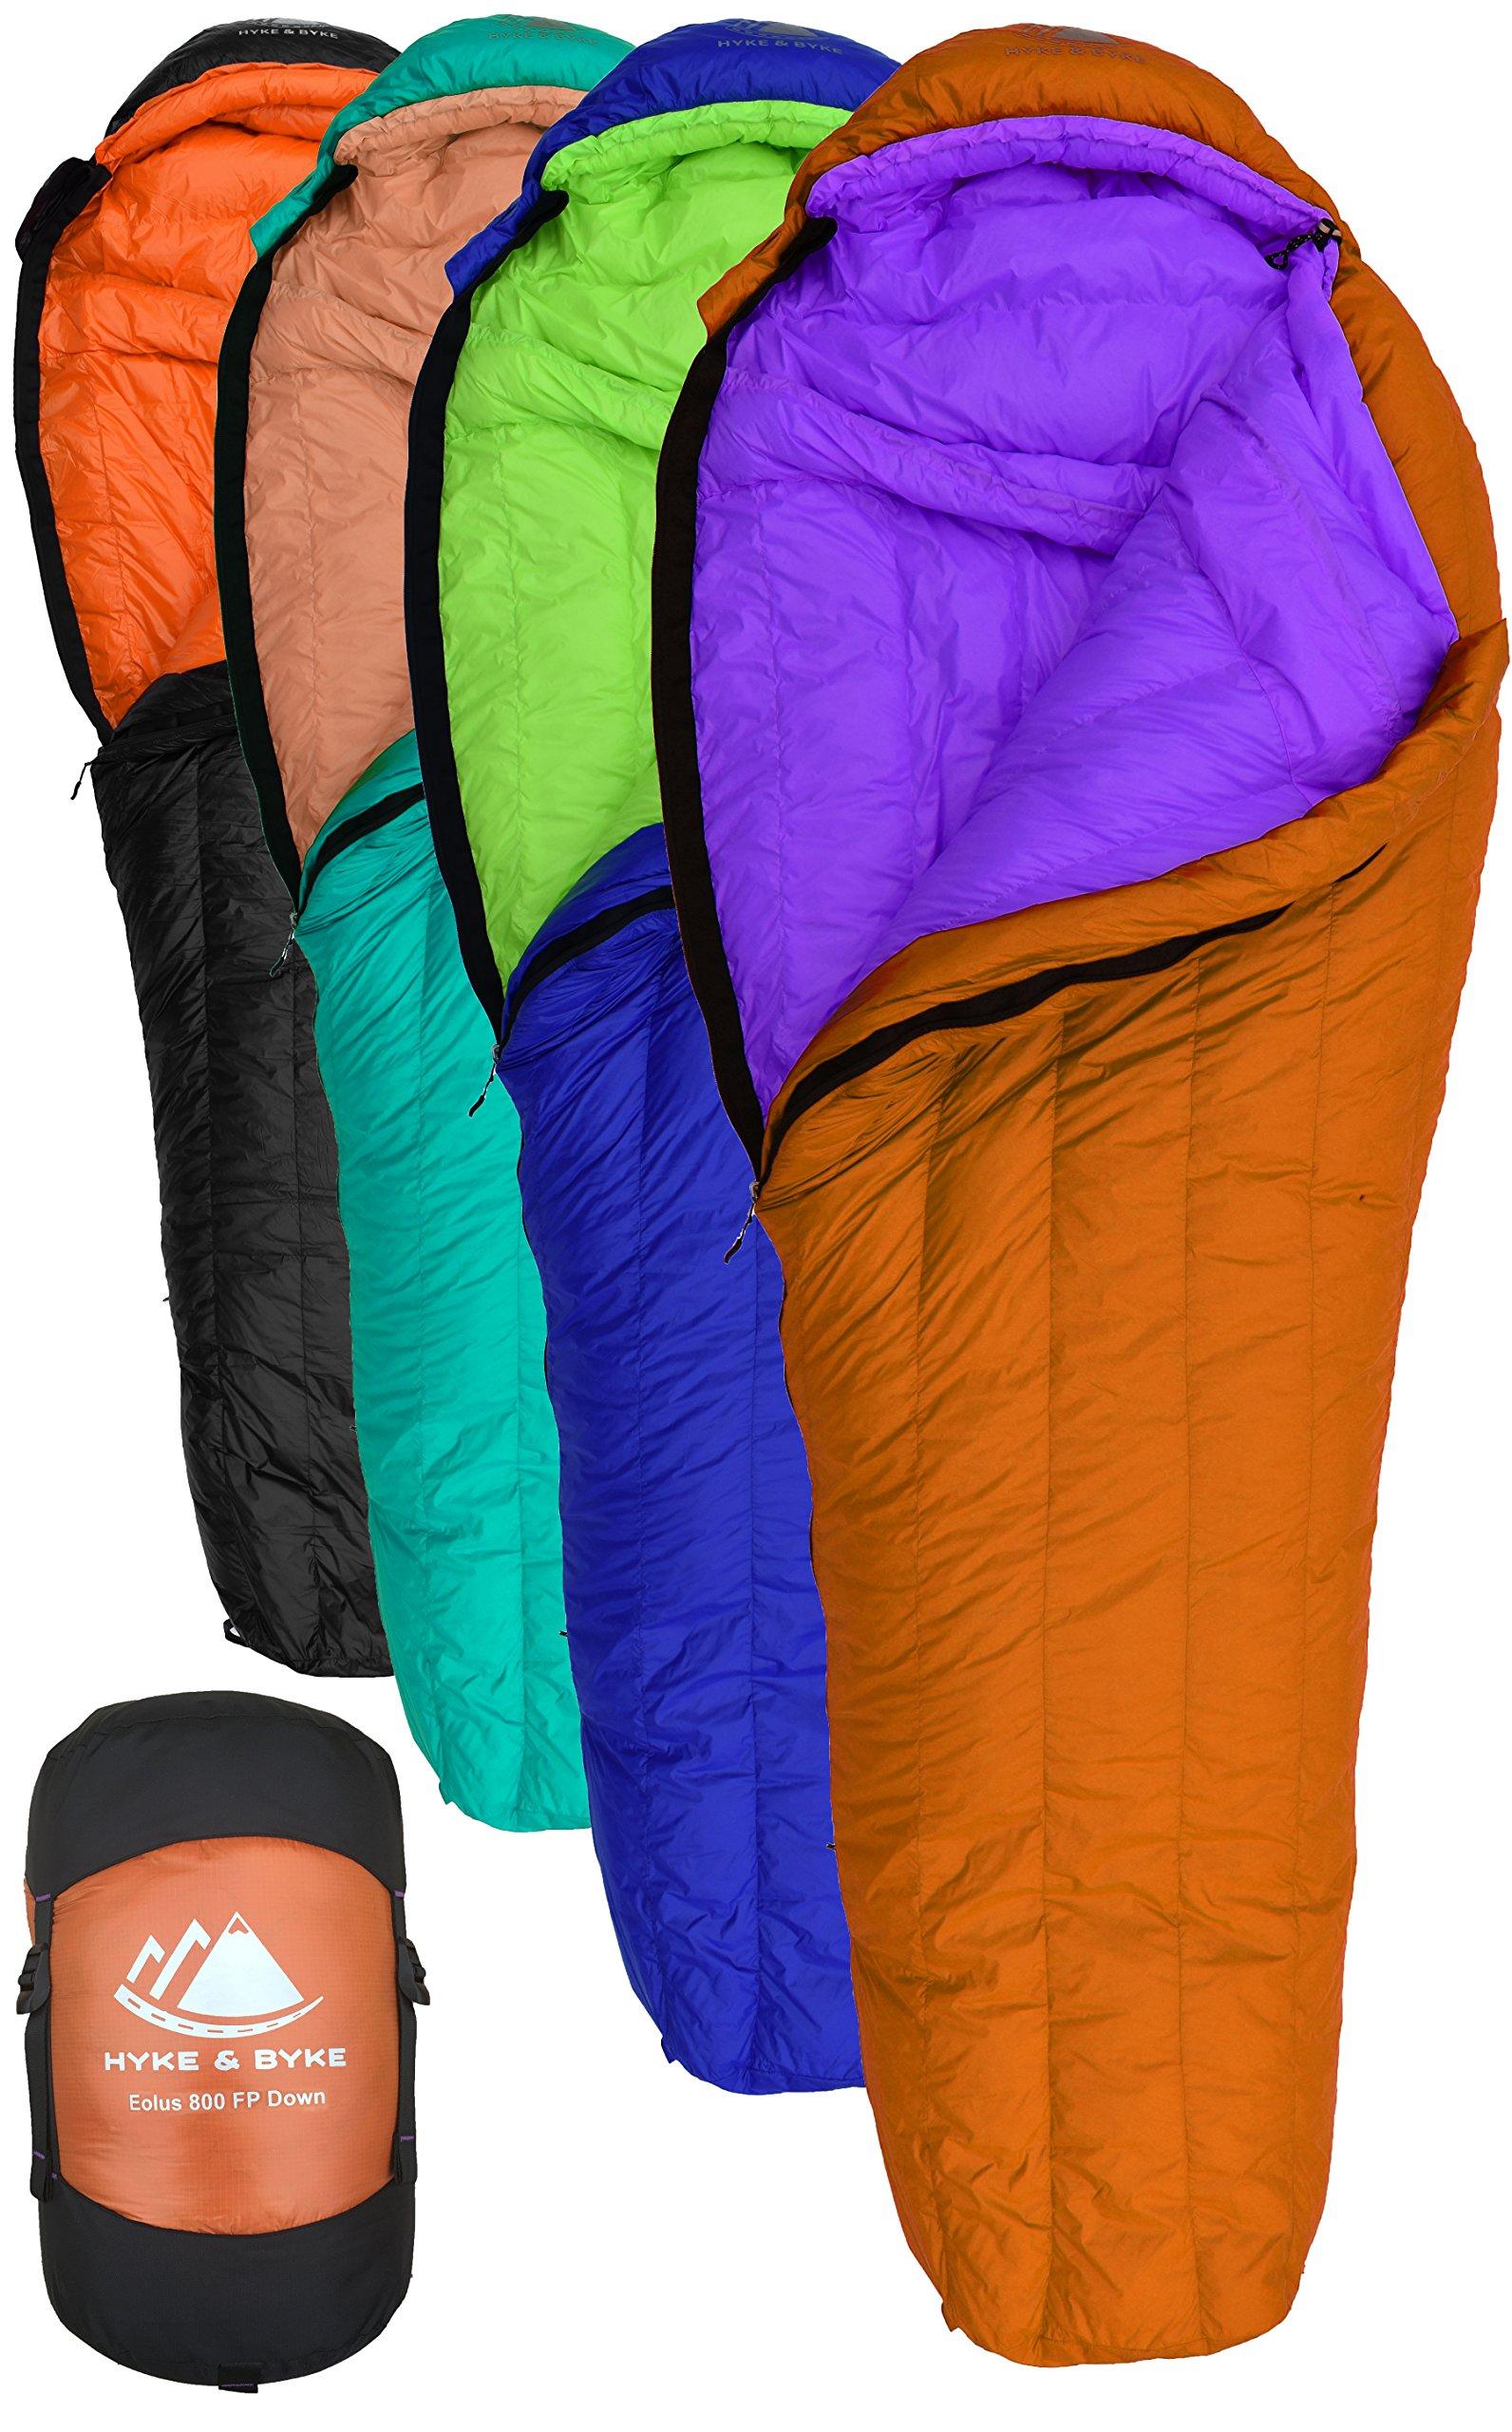 Hyke & Byke Eolus 15 & 30 Degree F 800 Fill Power Hydrophobic Goose Down Sleeping Bag with ClusterLoft Base - Ultra Lightweight 3 Season Men's and Women's Mummy Bag Designed for Backpacking by Hyke & Byke